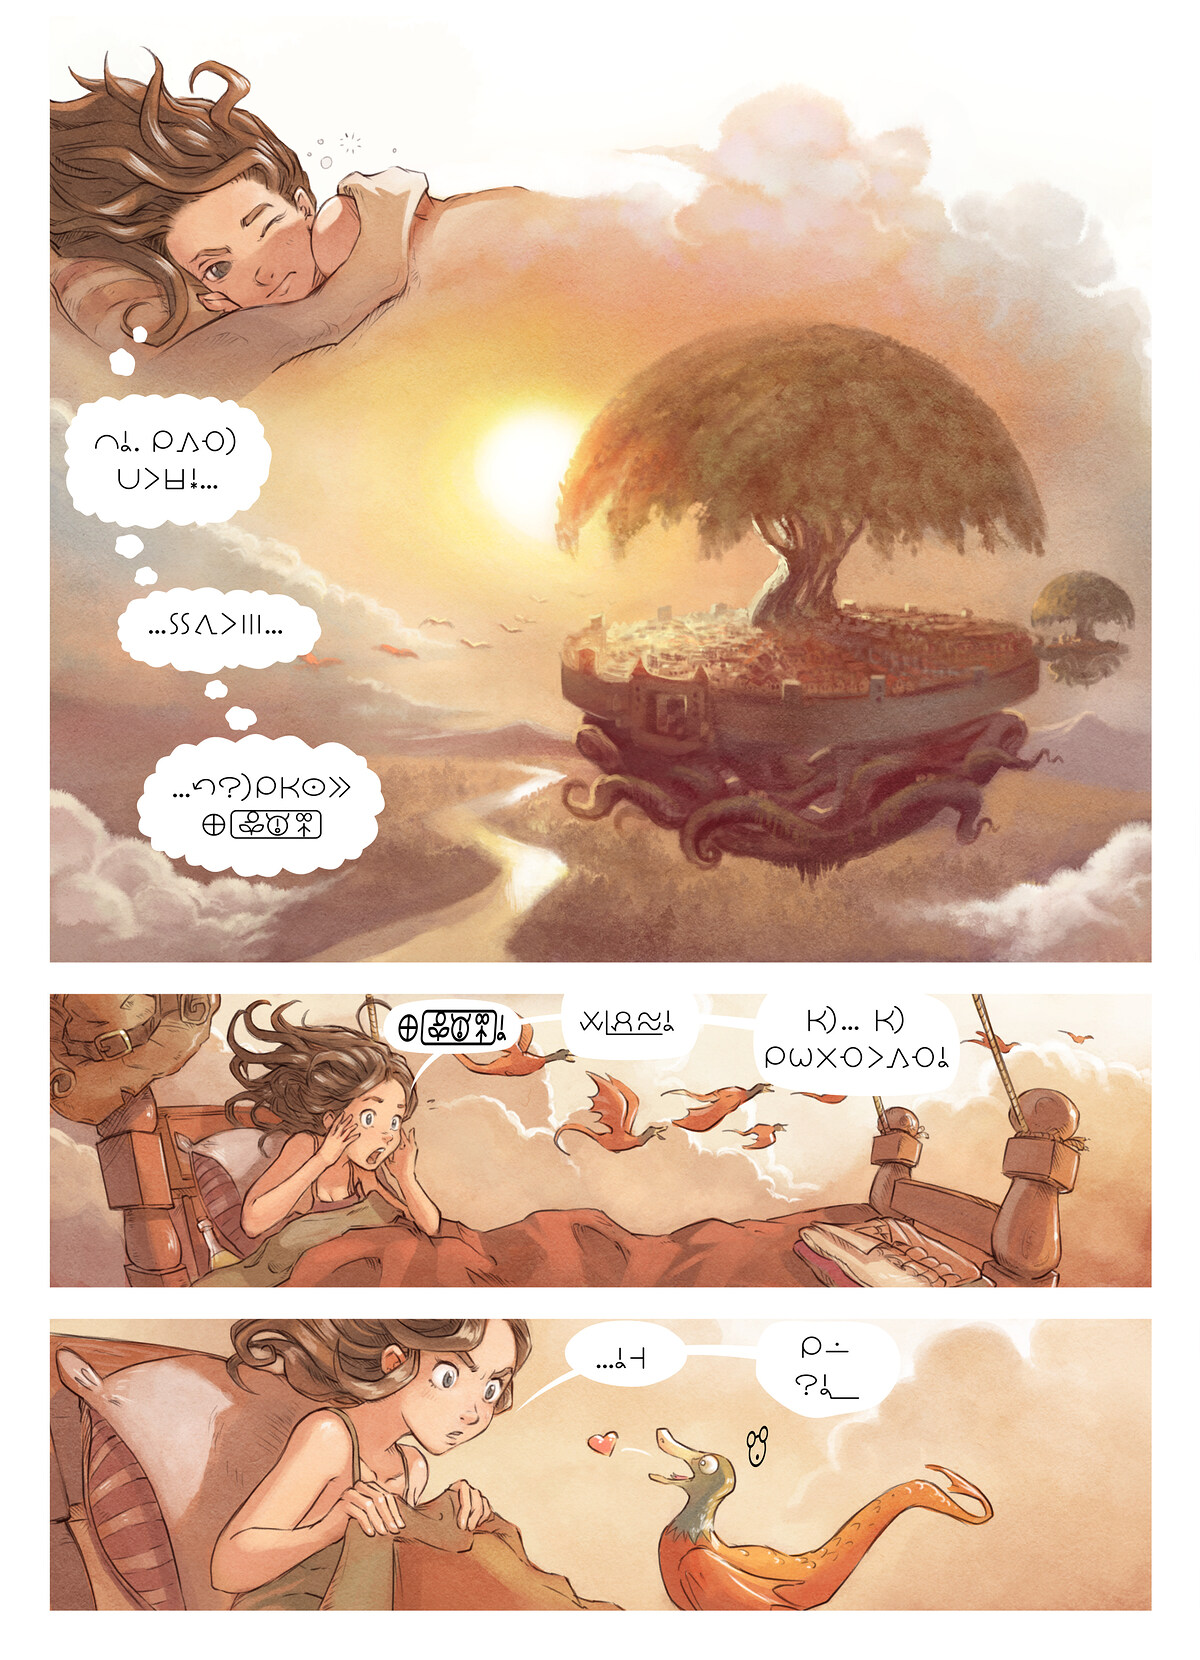 lipu nanpa luka wan: utala pi+__pali__telo, lipu lili nanpa 1